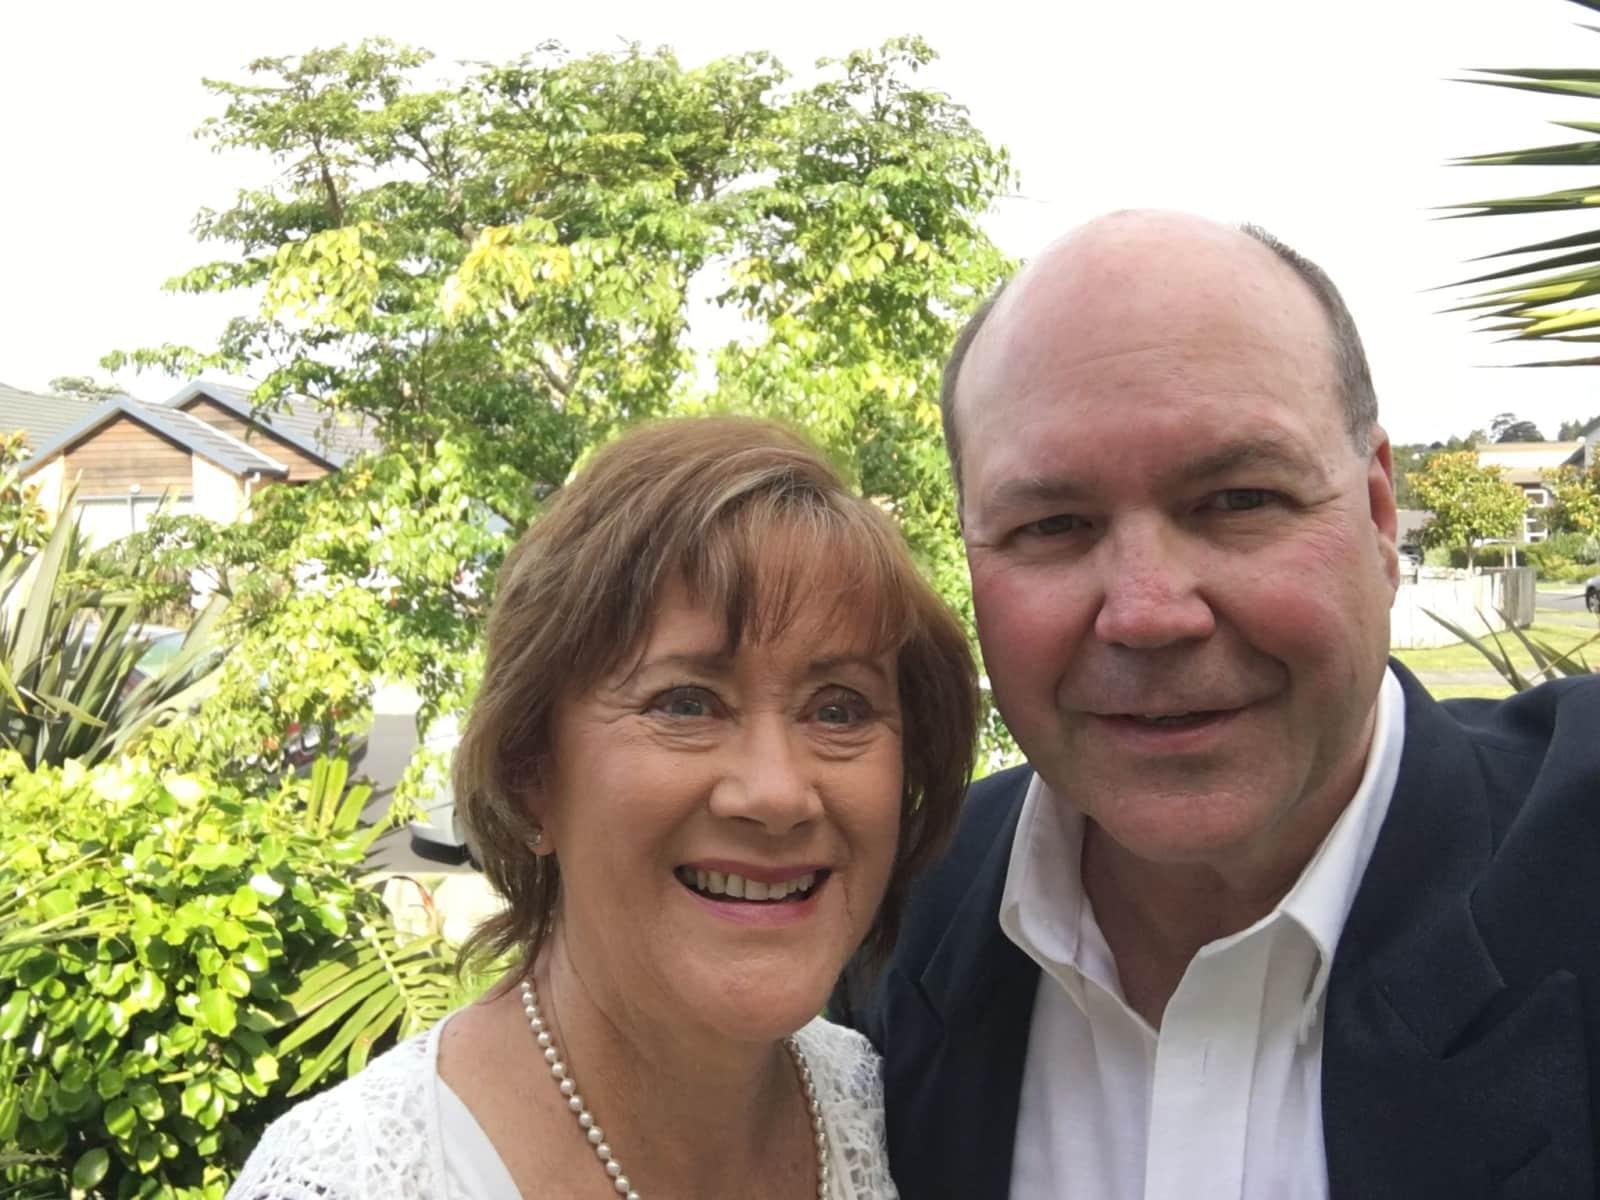 Jewel & John from Tauranga, New Zealand